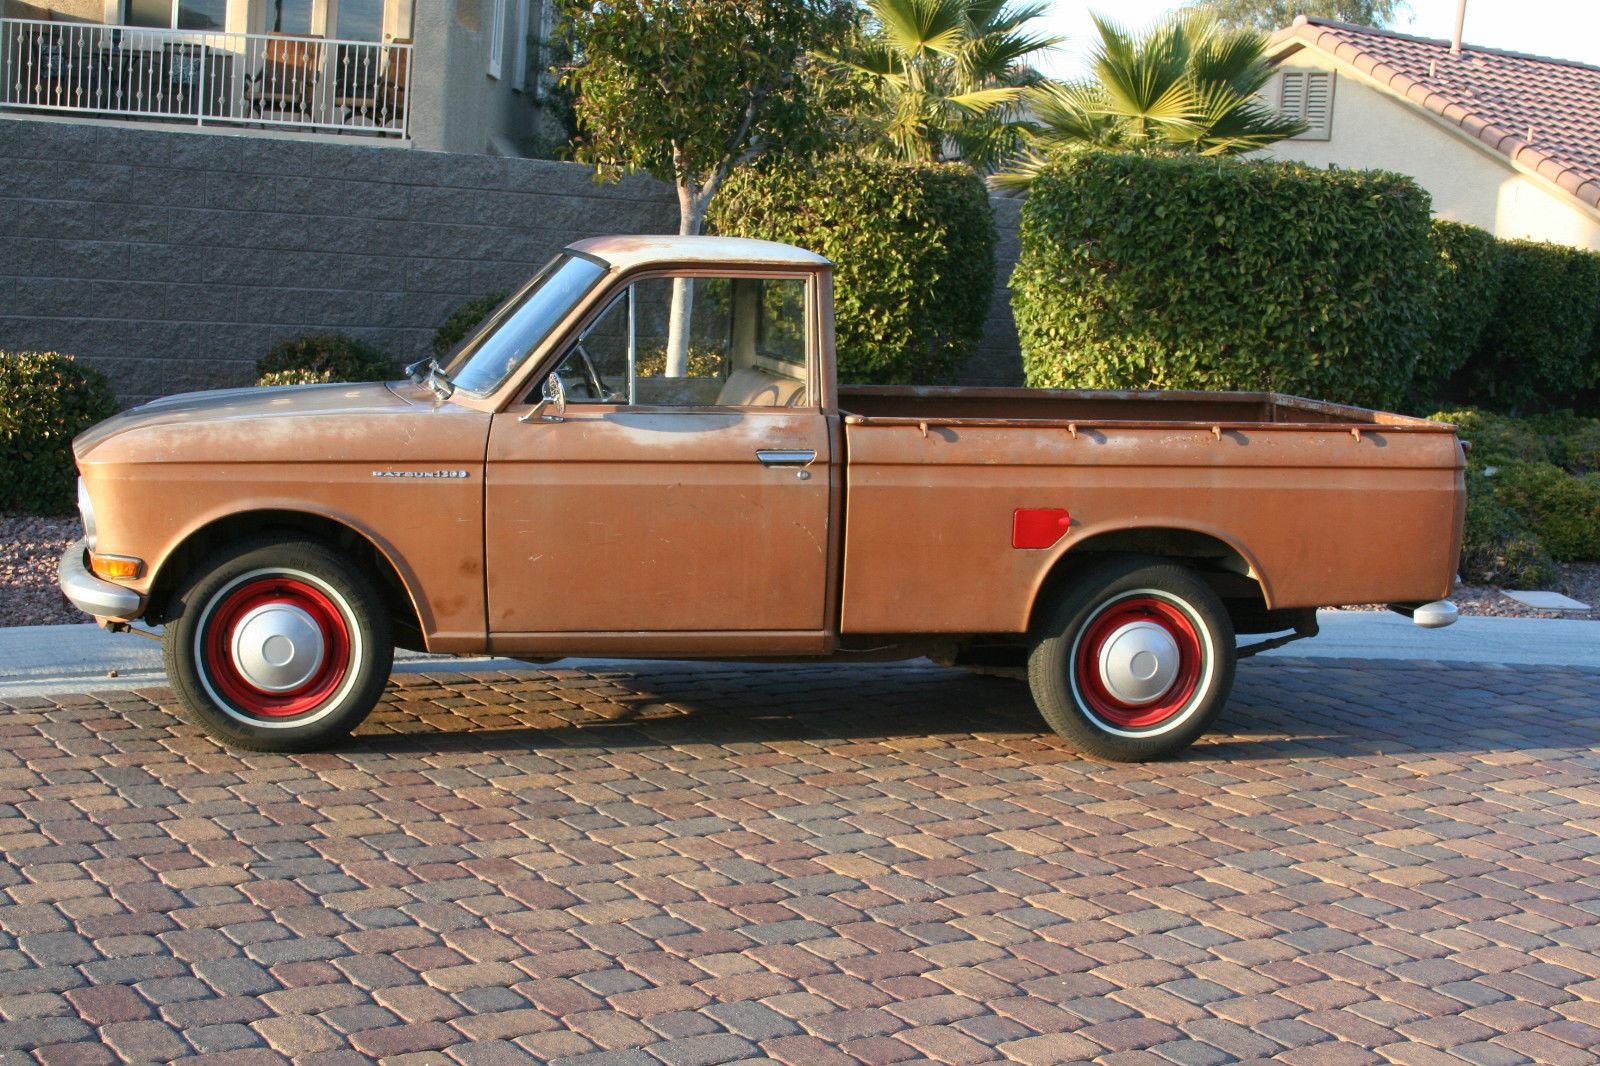 1966 Datsun pickup 520 earlier than 521 510 411 truck mini ...